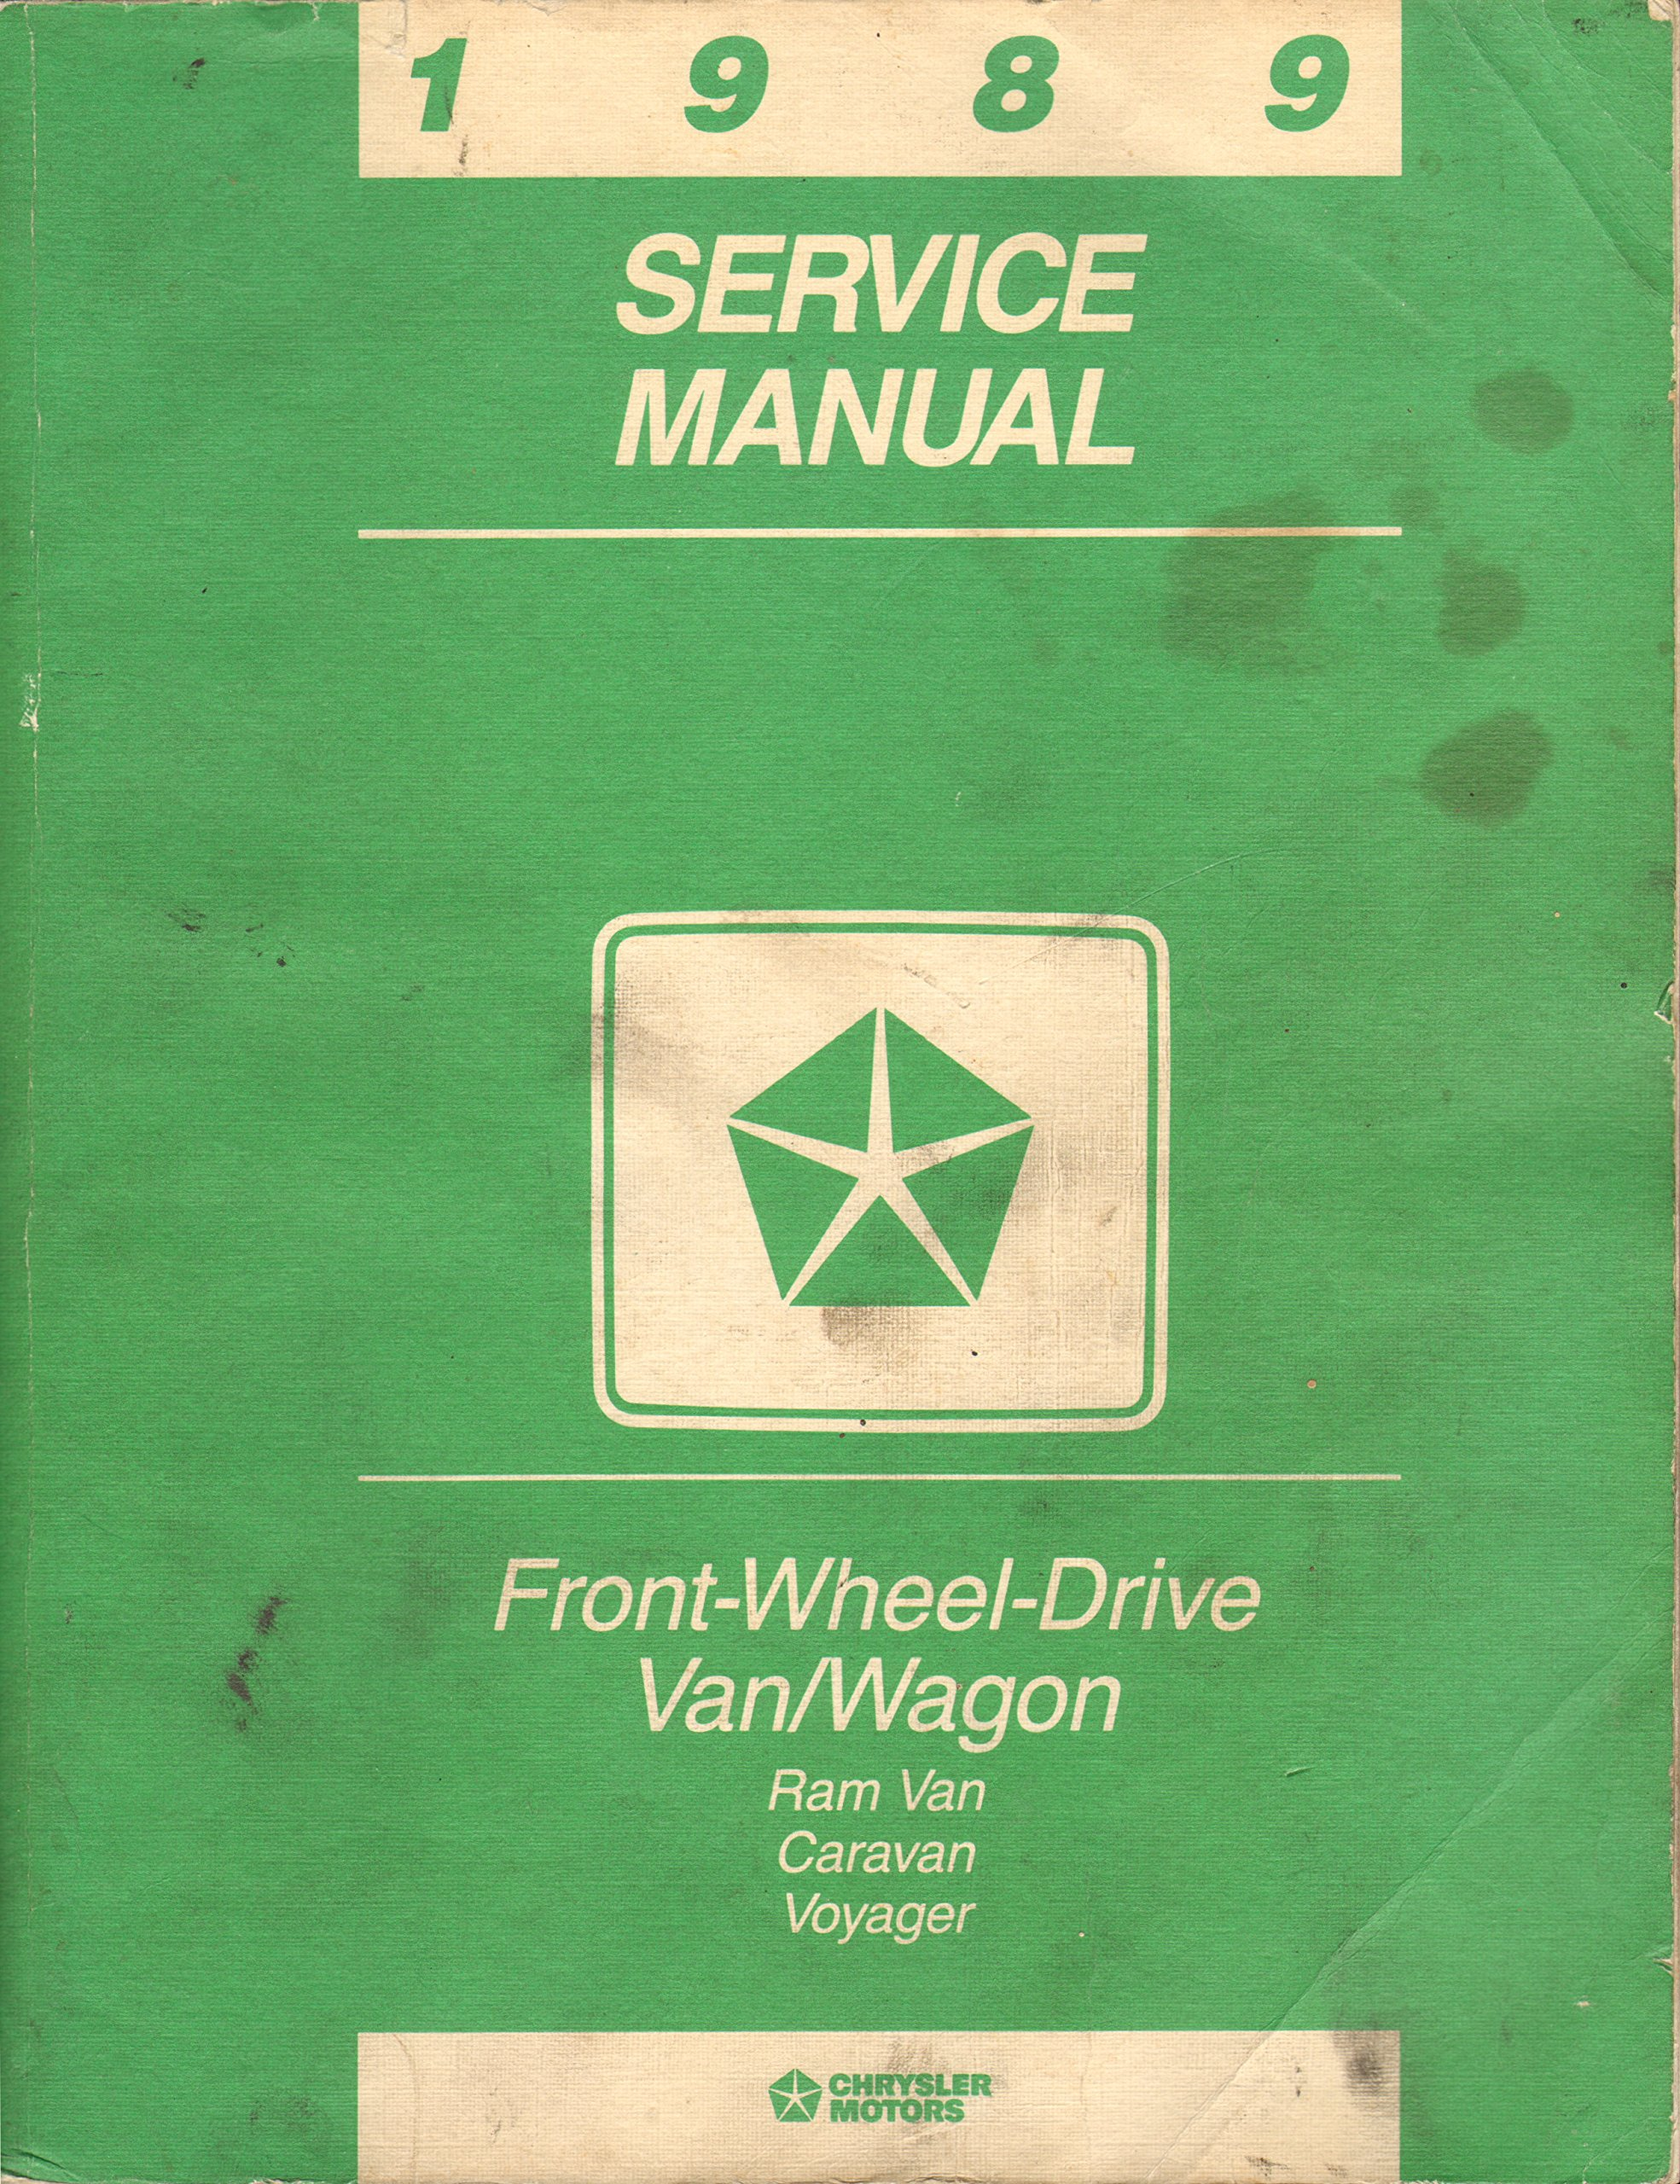 Chrysler Motors 1989 Service Manual. Front-Wheel-Drive Vans / Wagon. Ram Van,  Caravan, Voyager: Chrysler Motors: Amazon.com: Books